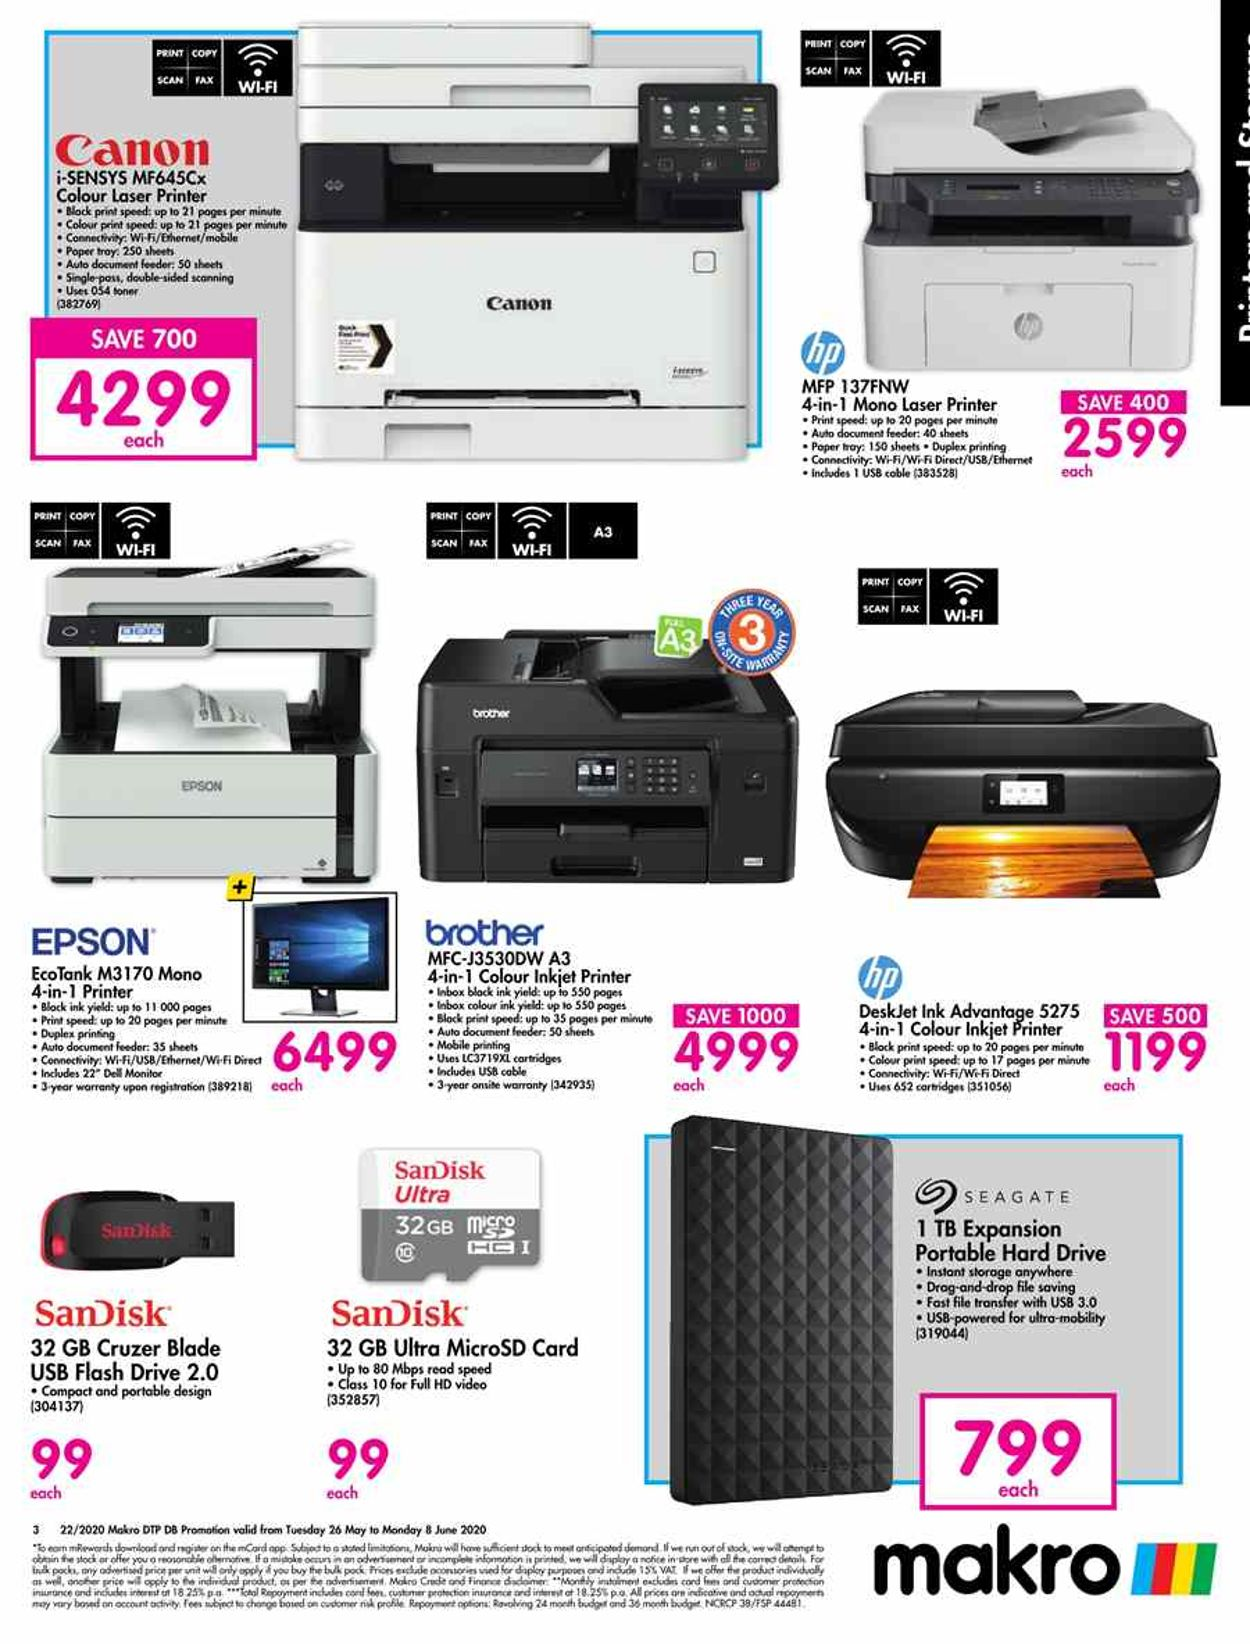 Makro Catalogue - 2020/05/26-2020/06/08 (Page 3)